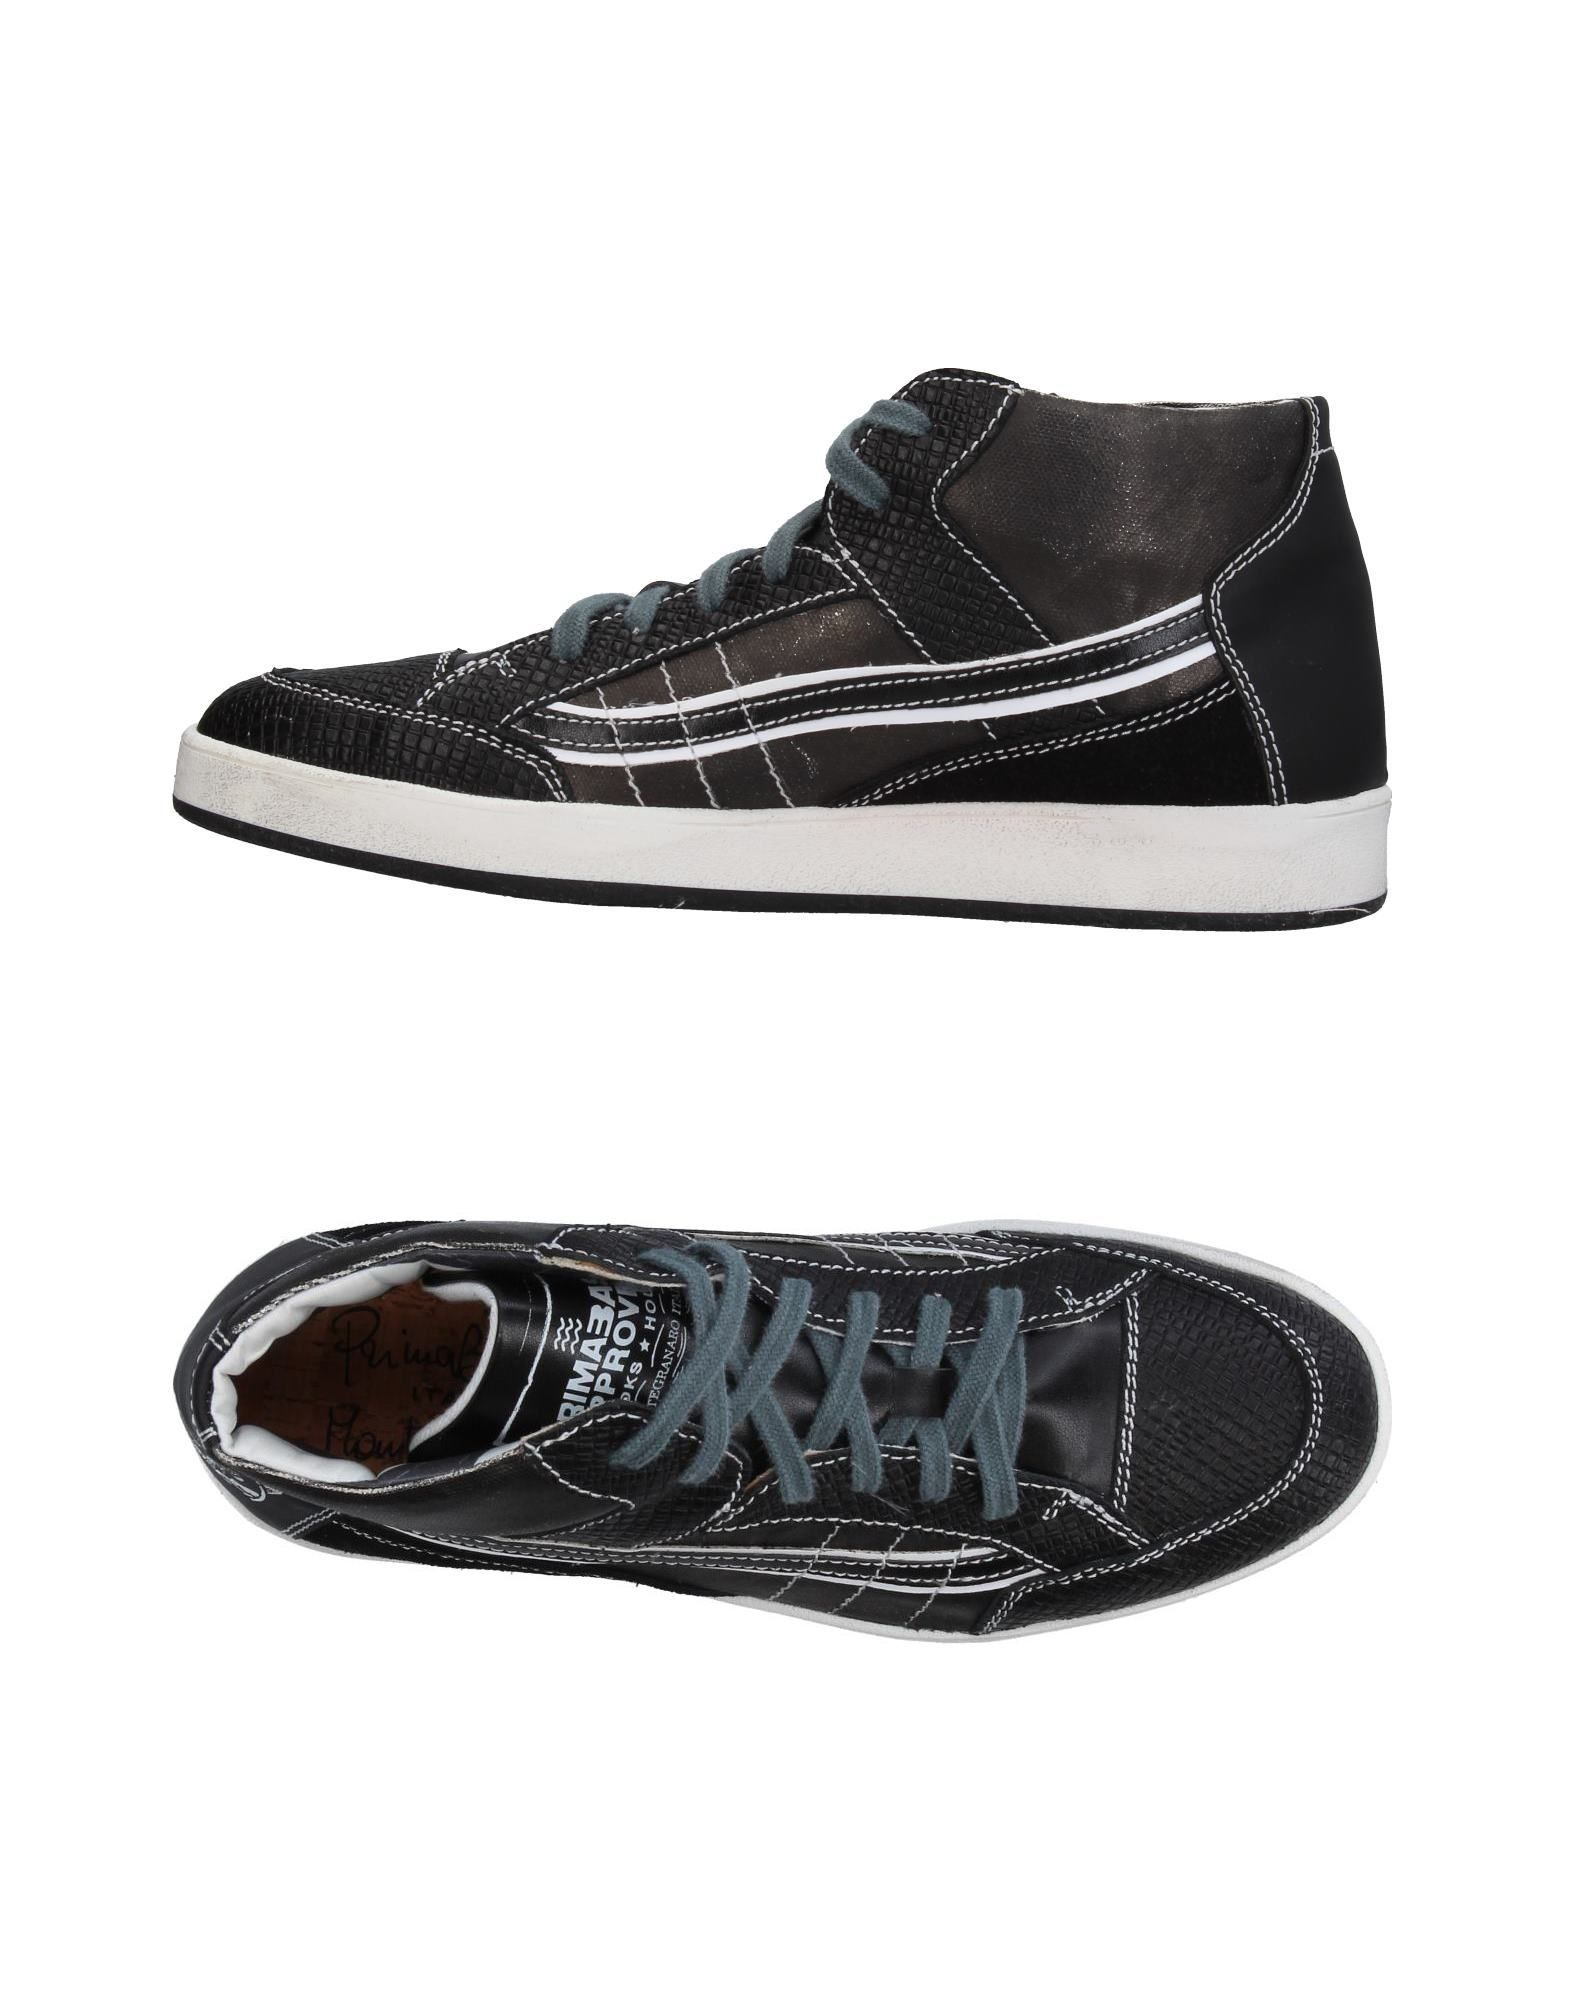 Primabase Heiße Sneakers Herren  11385774LF Heiße Primabase Schuhe 37090e